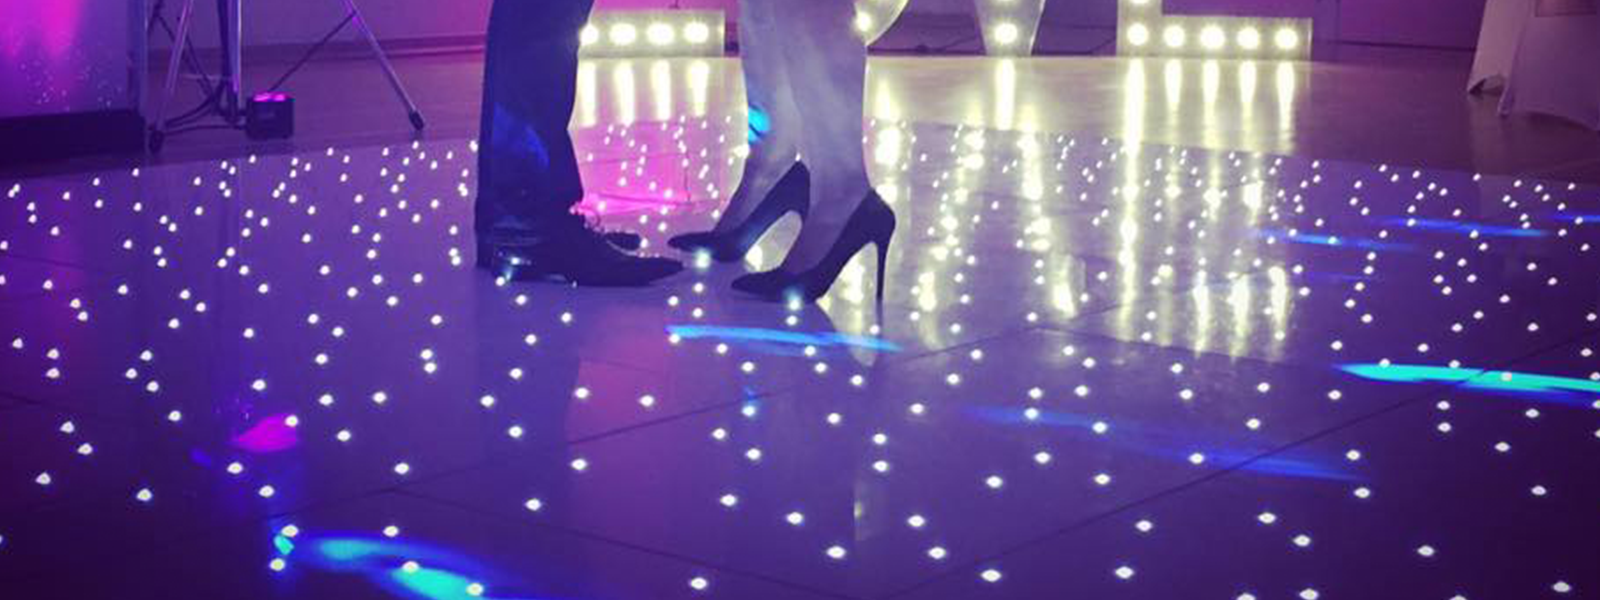 Starlit Dance Floors